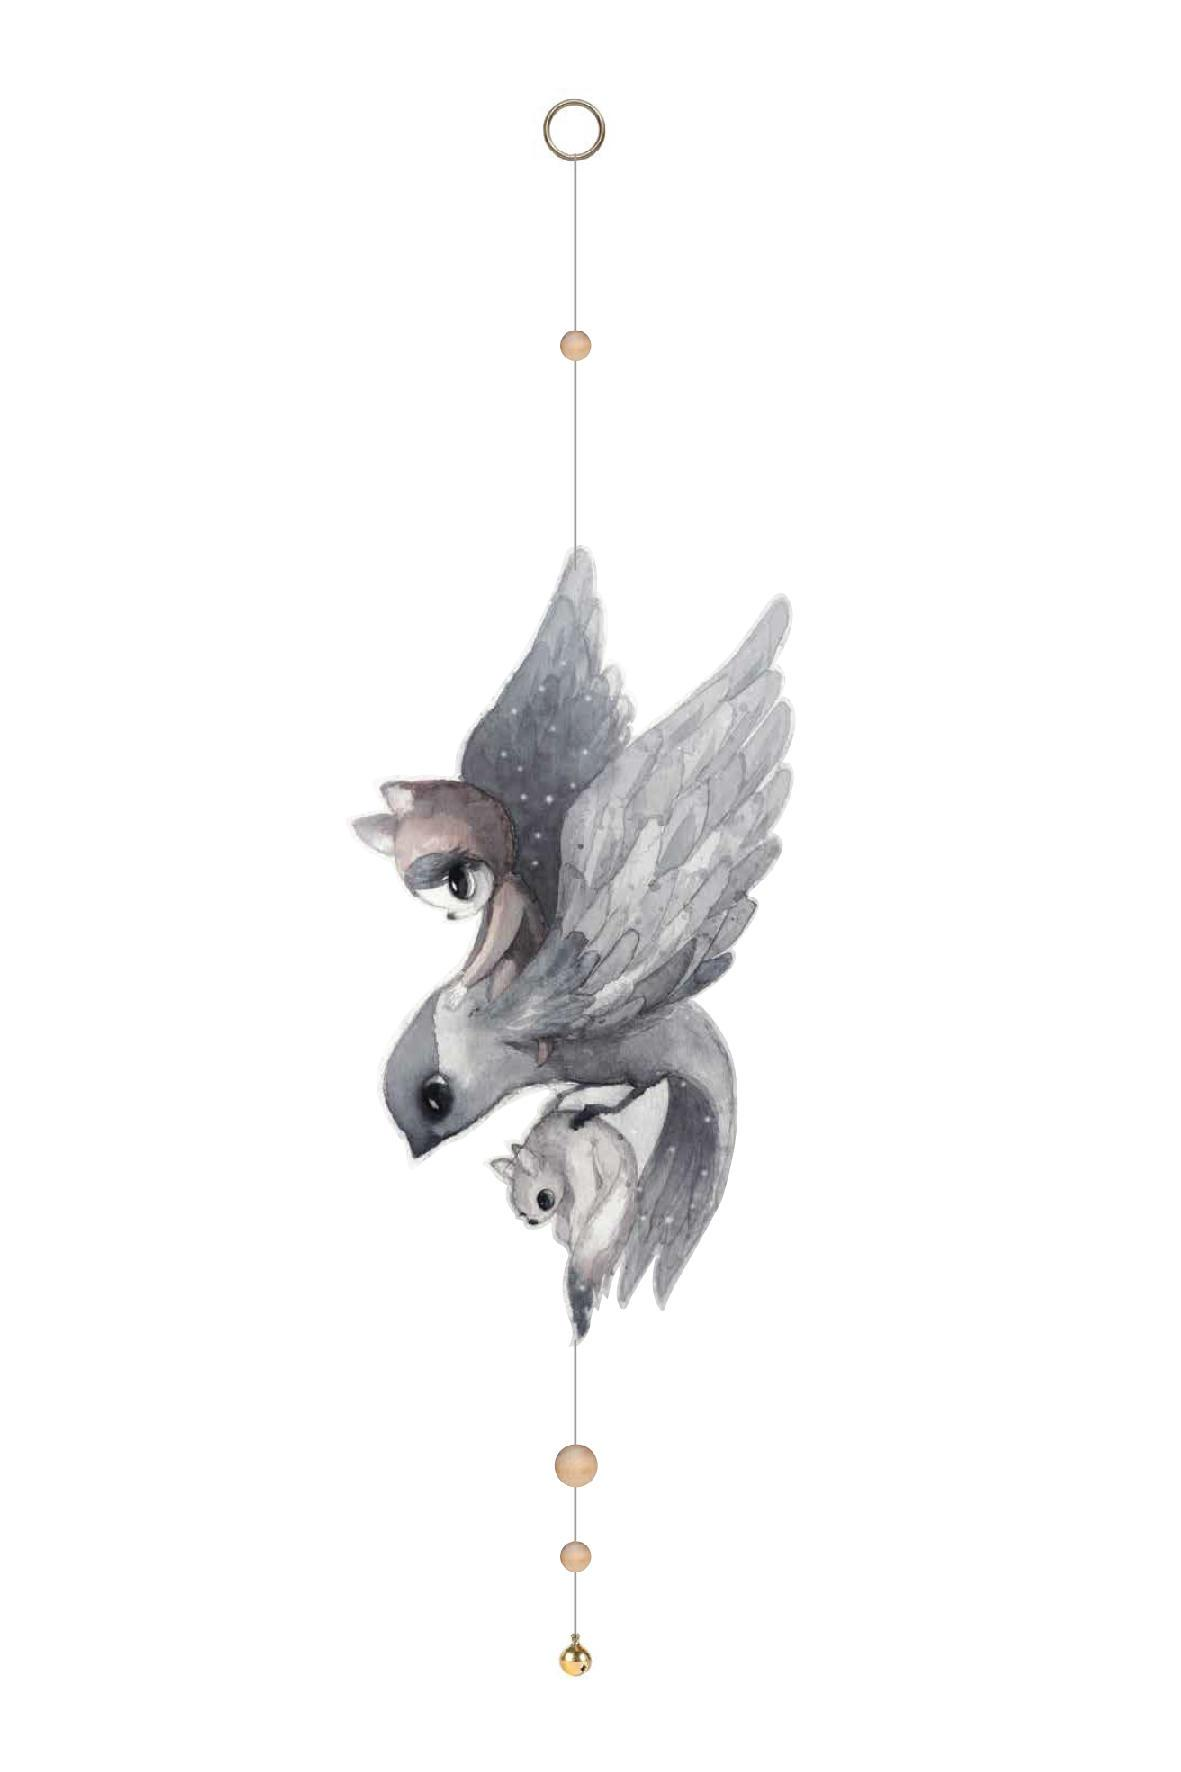 MRS. MIGHETTO Závěsná dekorace nad postýlku FLYING SPARROW, šedá barva, papír